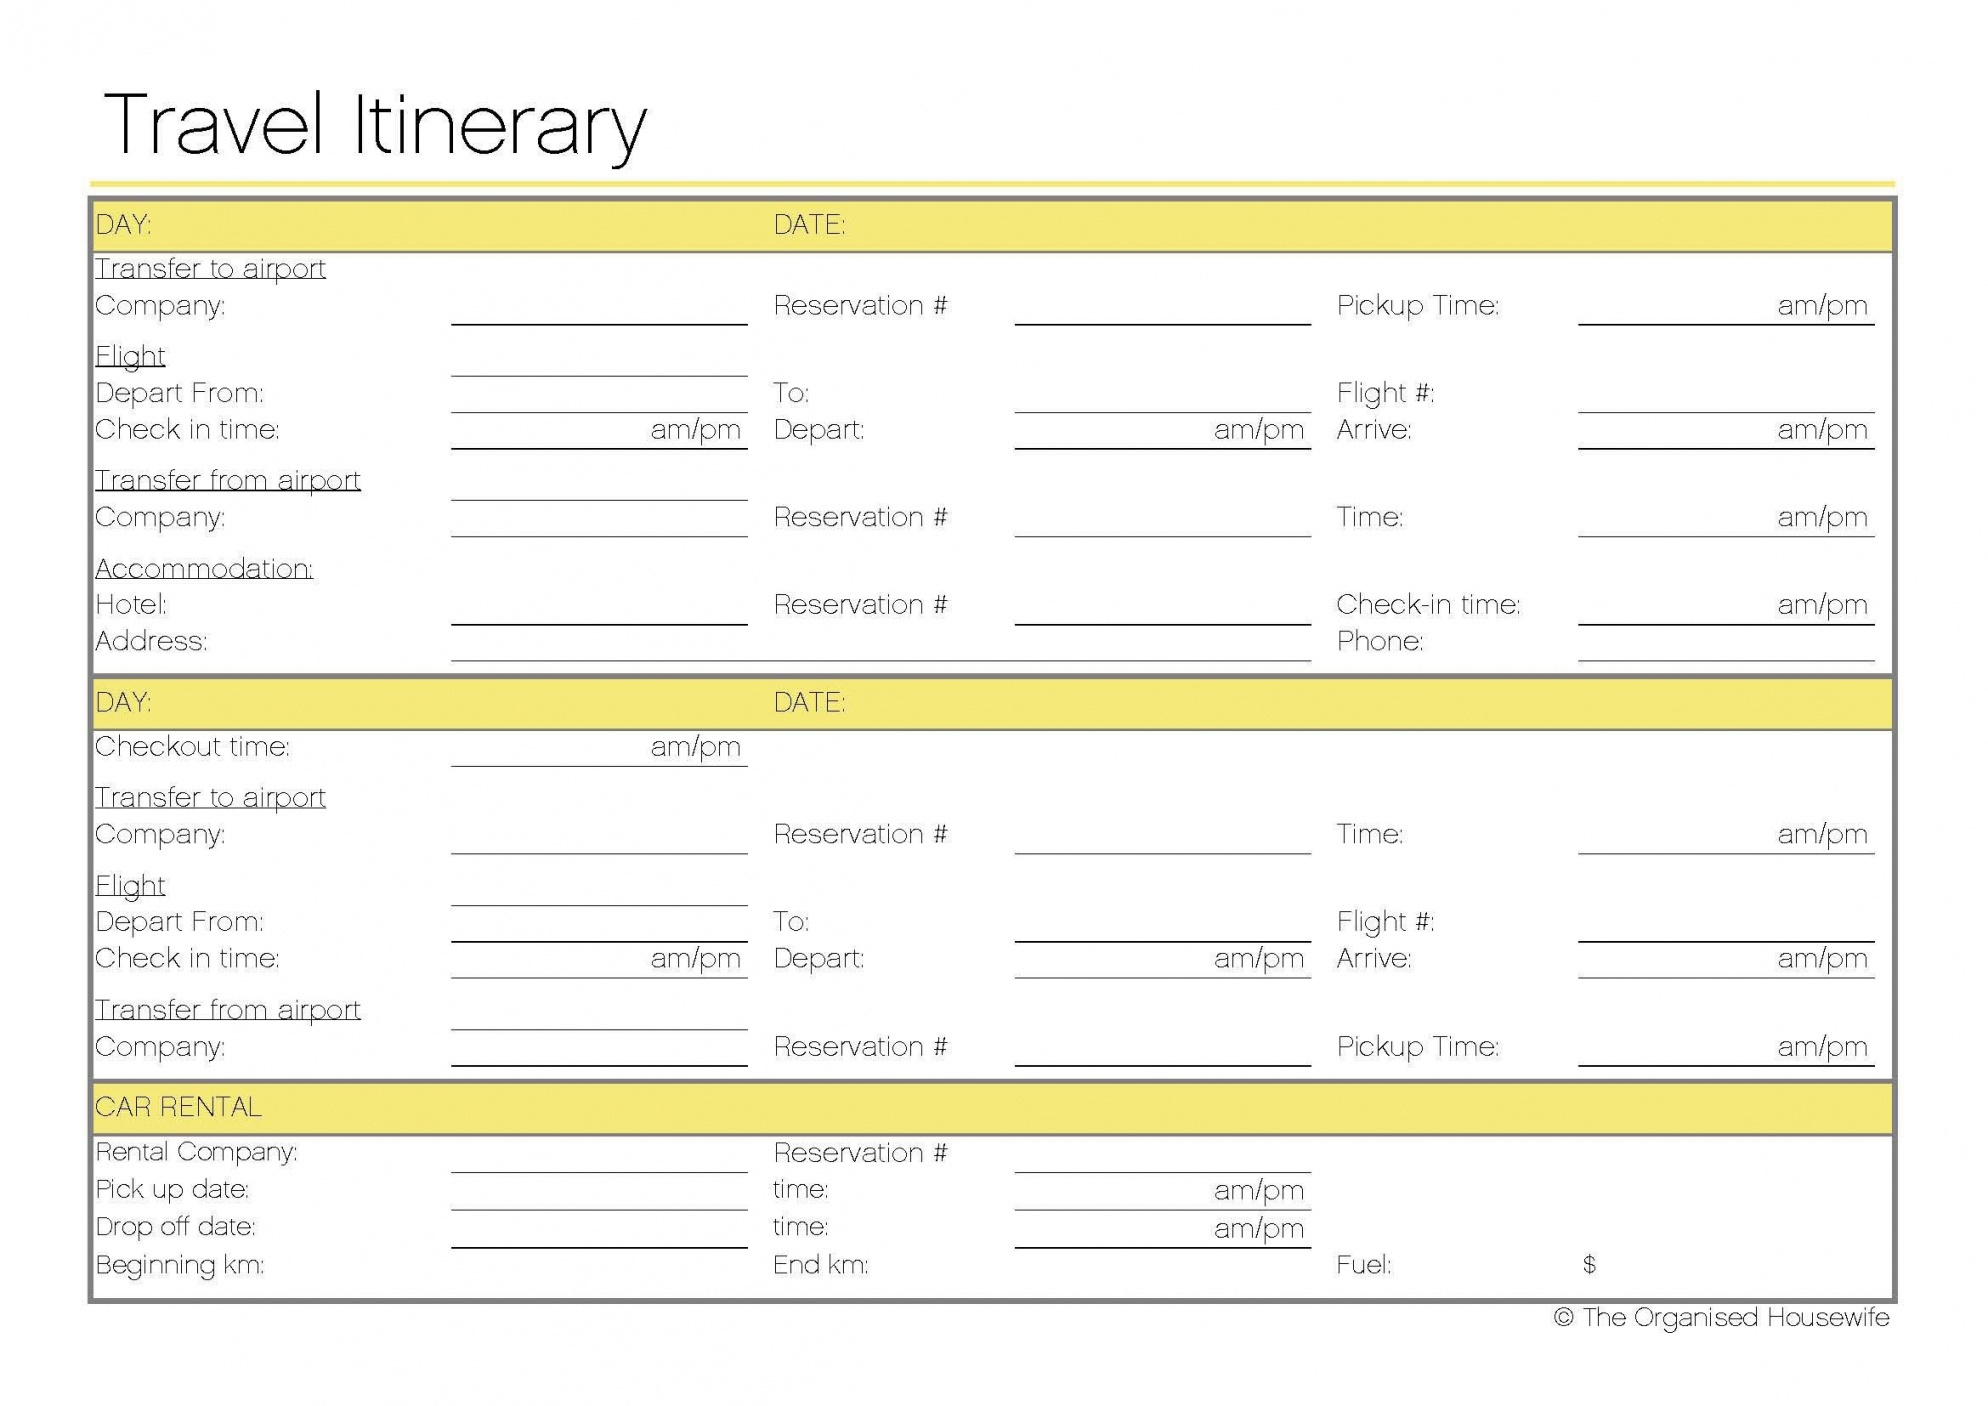 Free Printable – Travel Itinerary | Itineraries, Etc. | Pinterest - Free Printable Itinerary